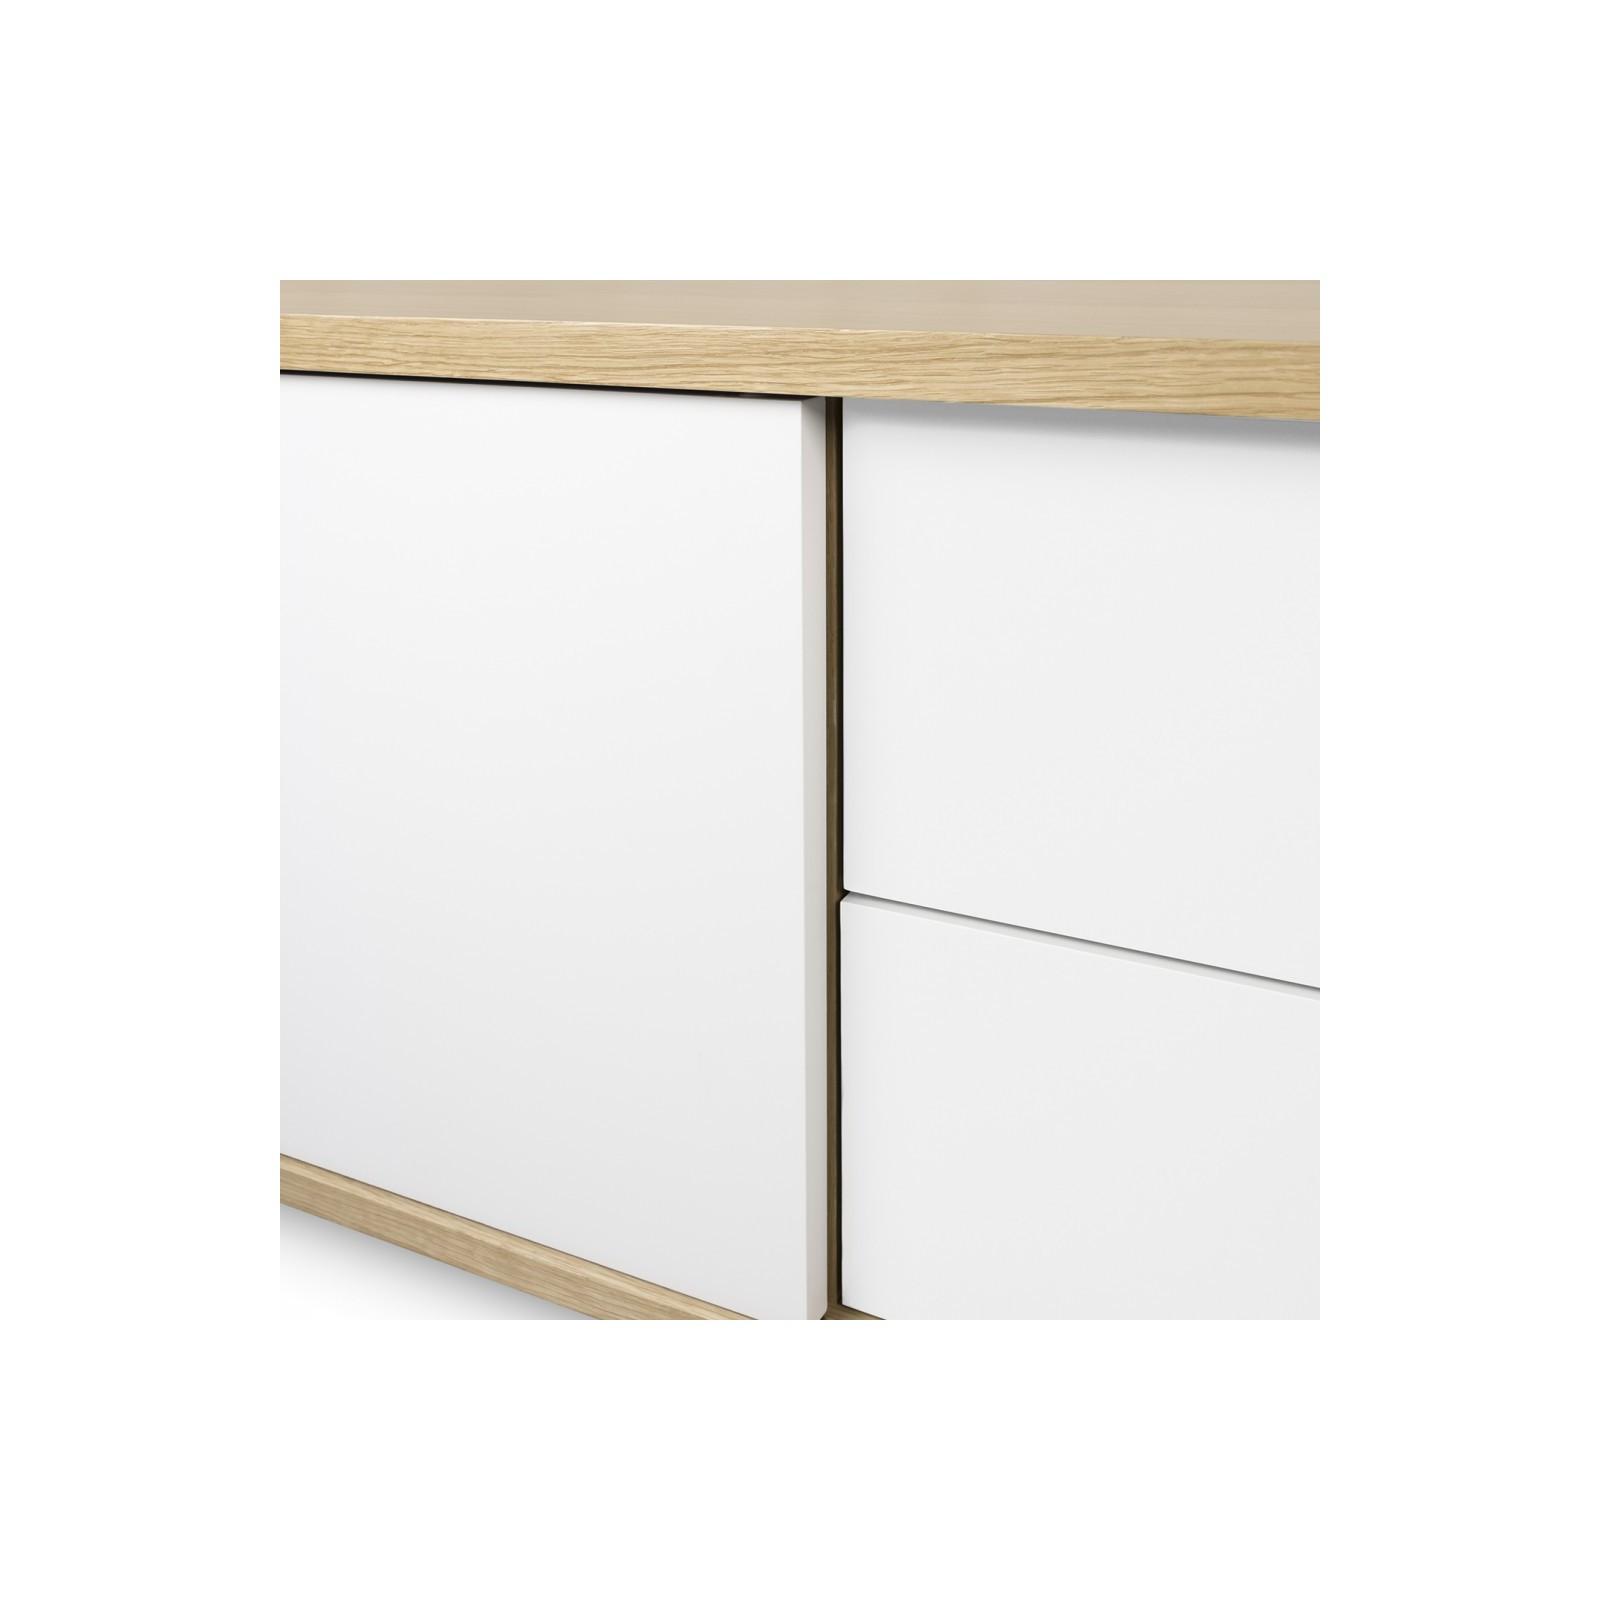 Meuble tv danois blanc et bois arne concept - Meuble bois et blanc ...